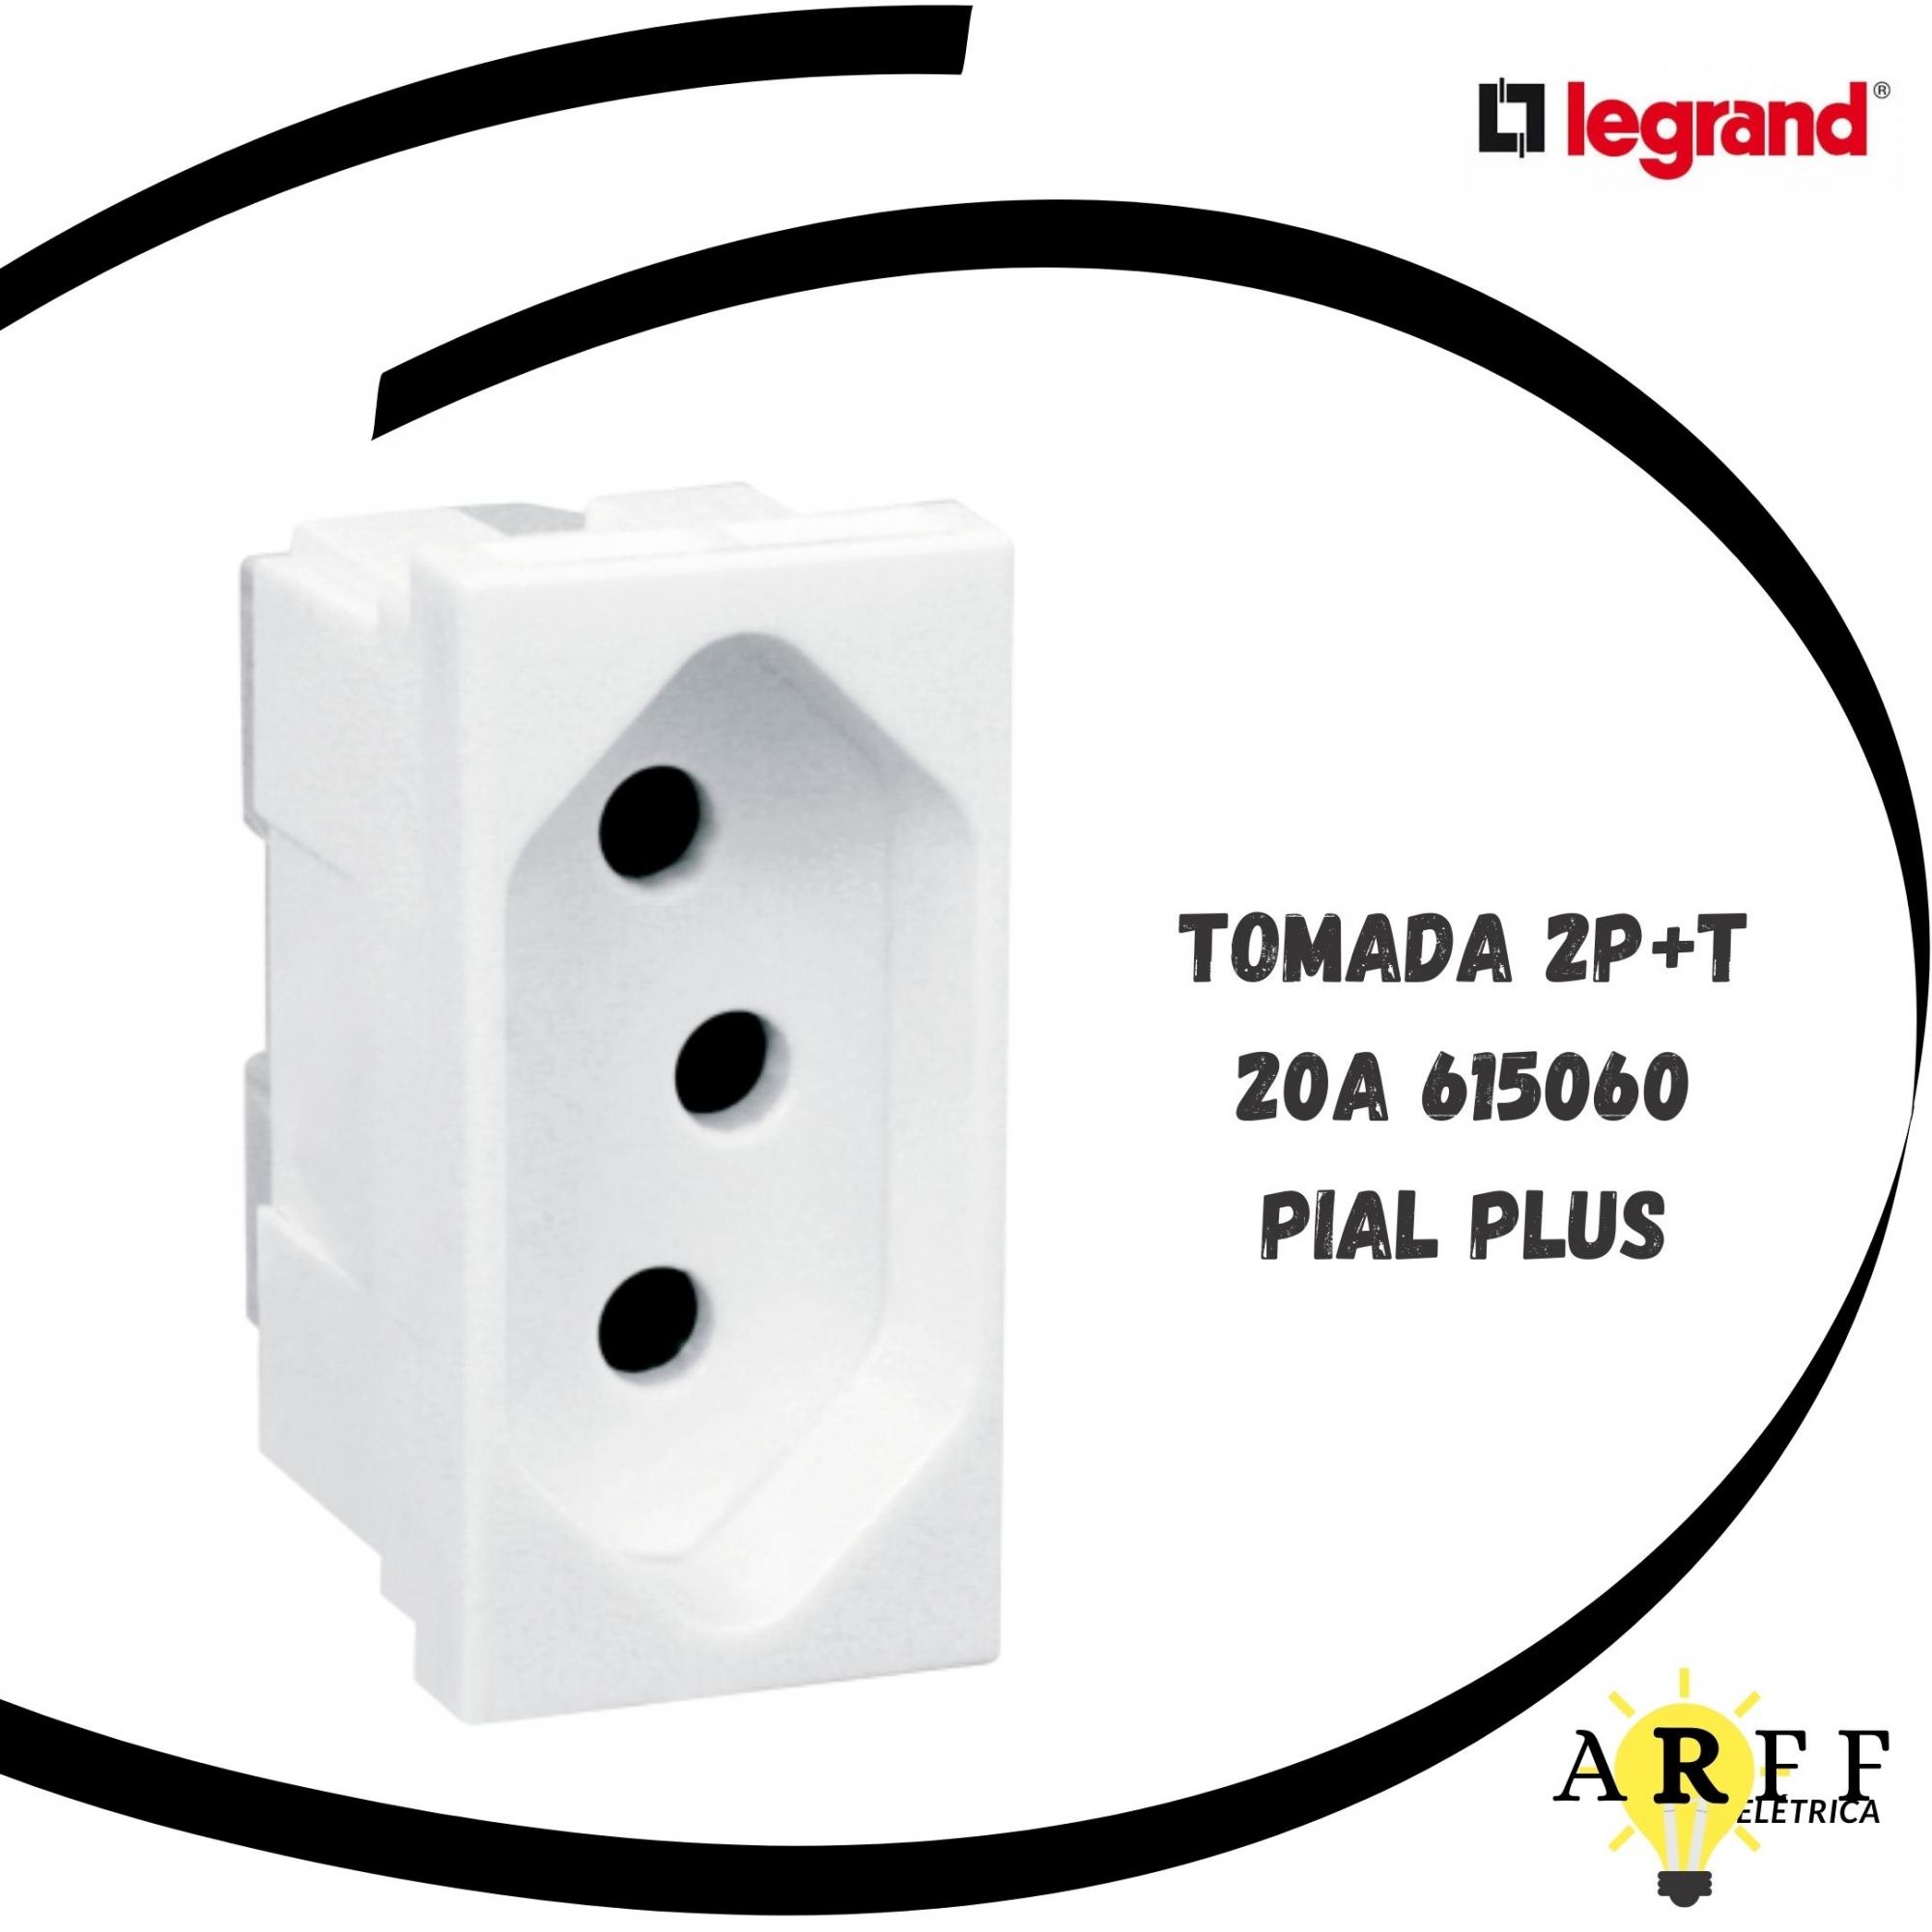 615060 Tomada 2P+T 20A - PIAL PLUS LEGRAND